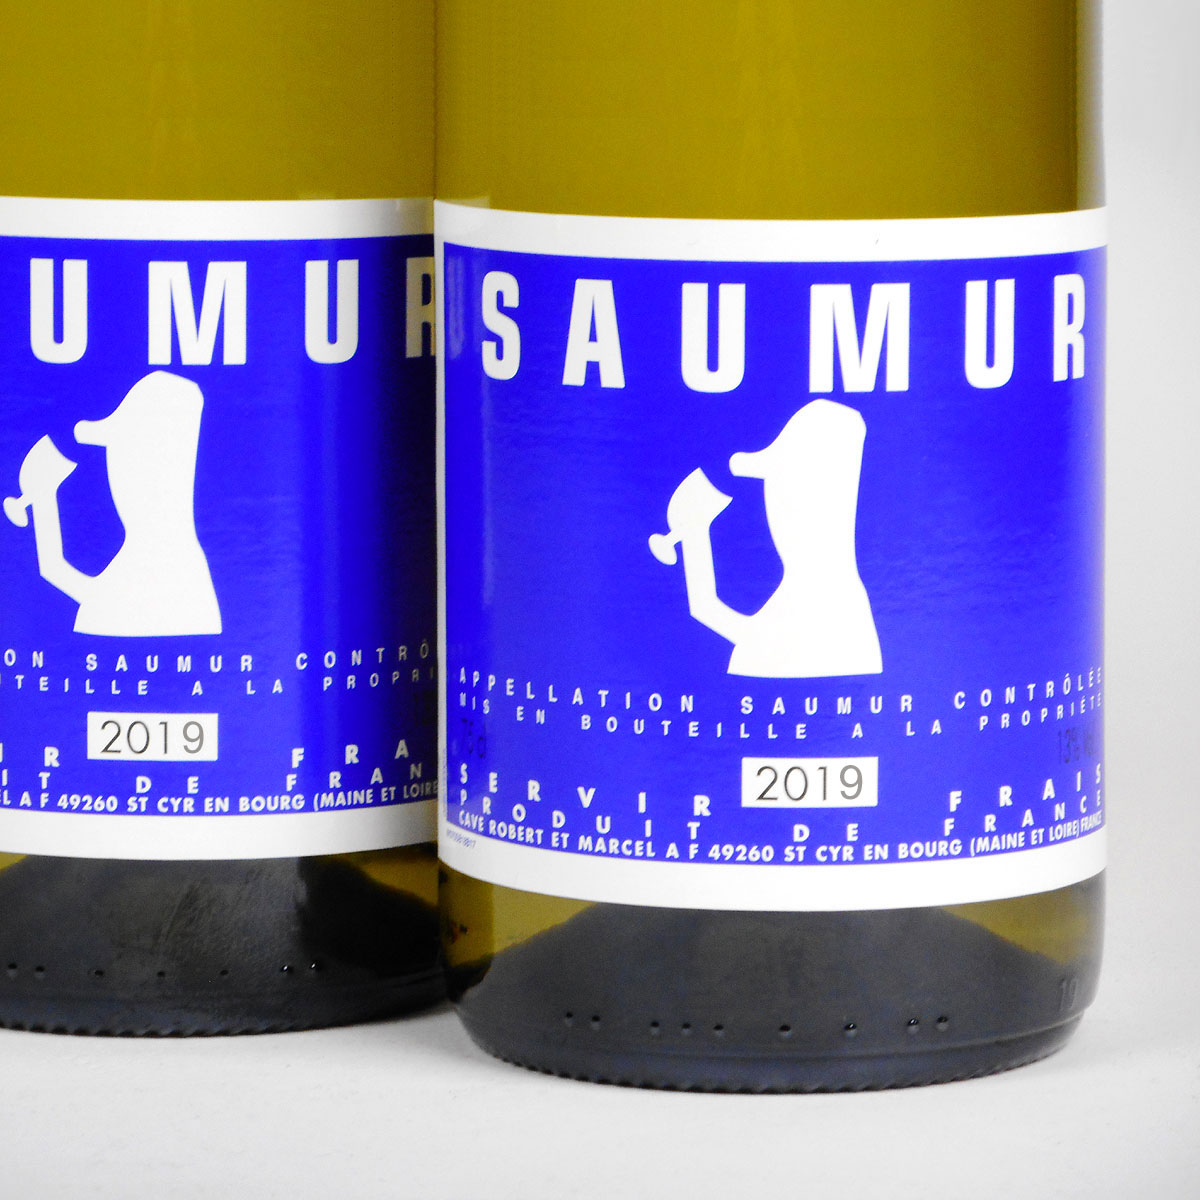 Saumur Blanc 2019